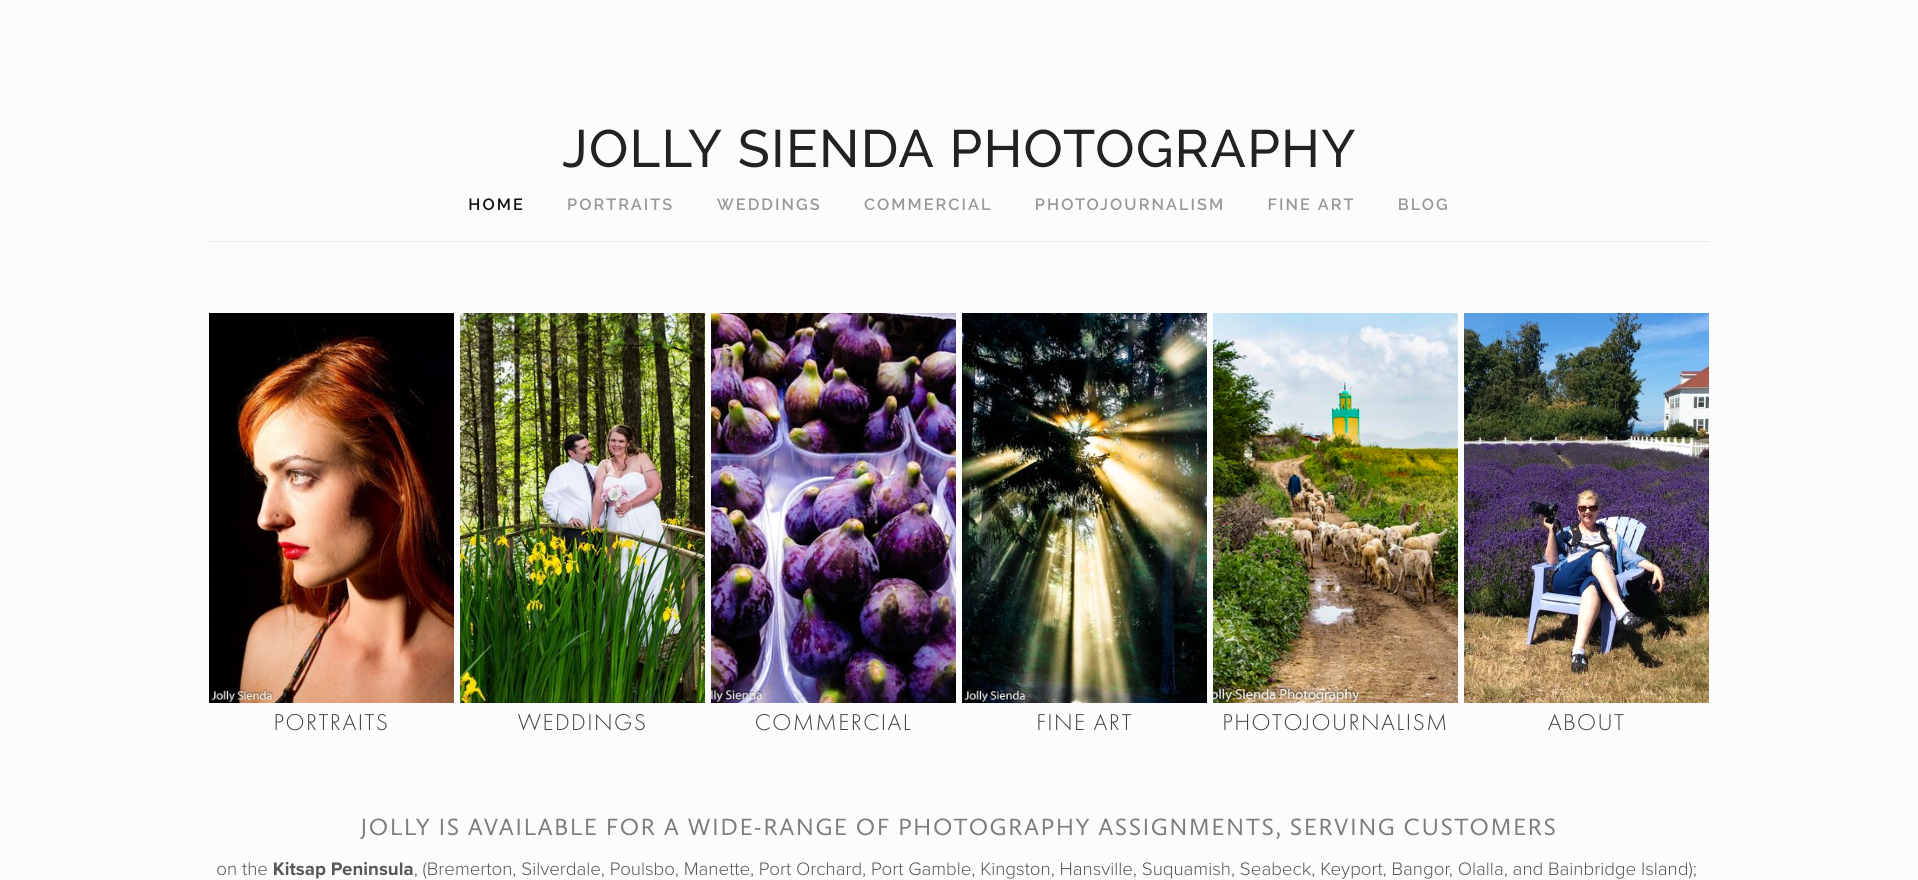 Jolly Sienda Photography